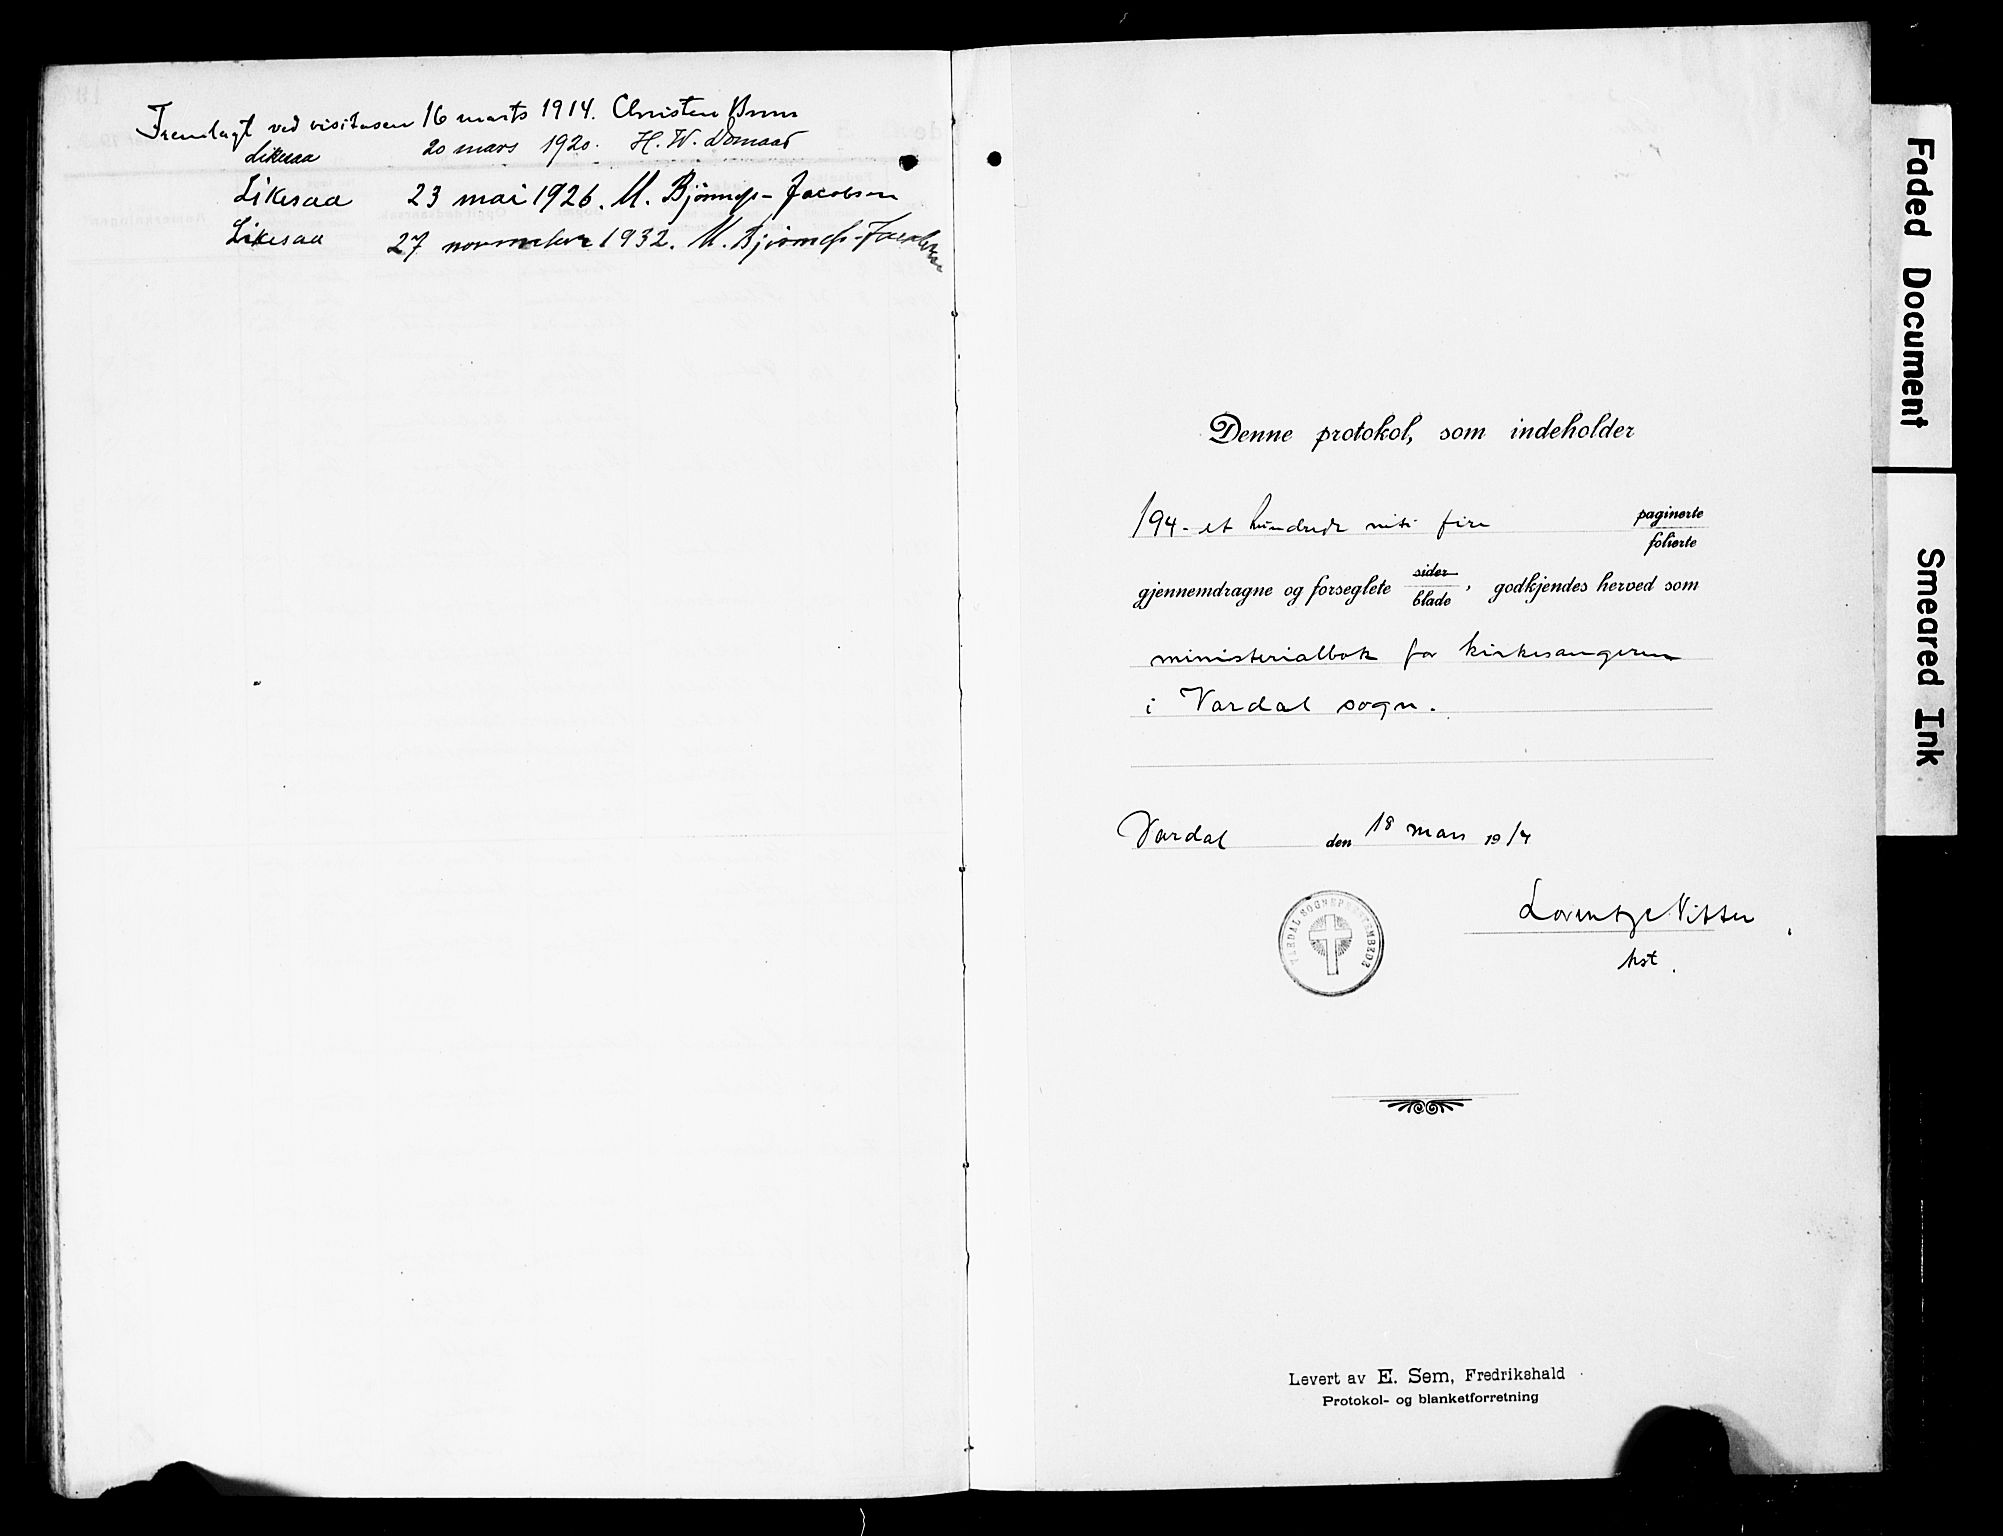 SAH, Vardal prestekontor, H/Ha/Hab/L0015: Klokkerbok nr. 15, 1914-1931